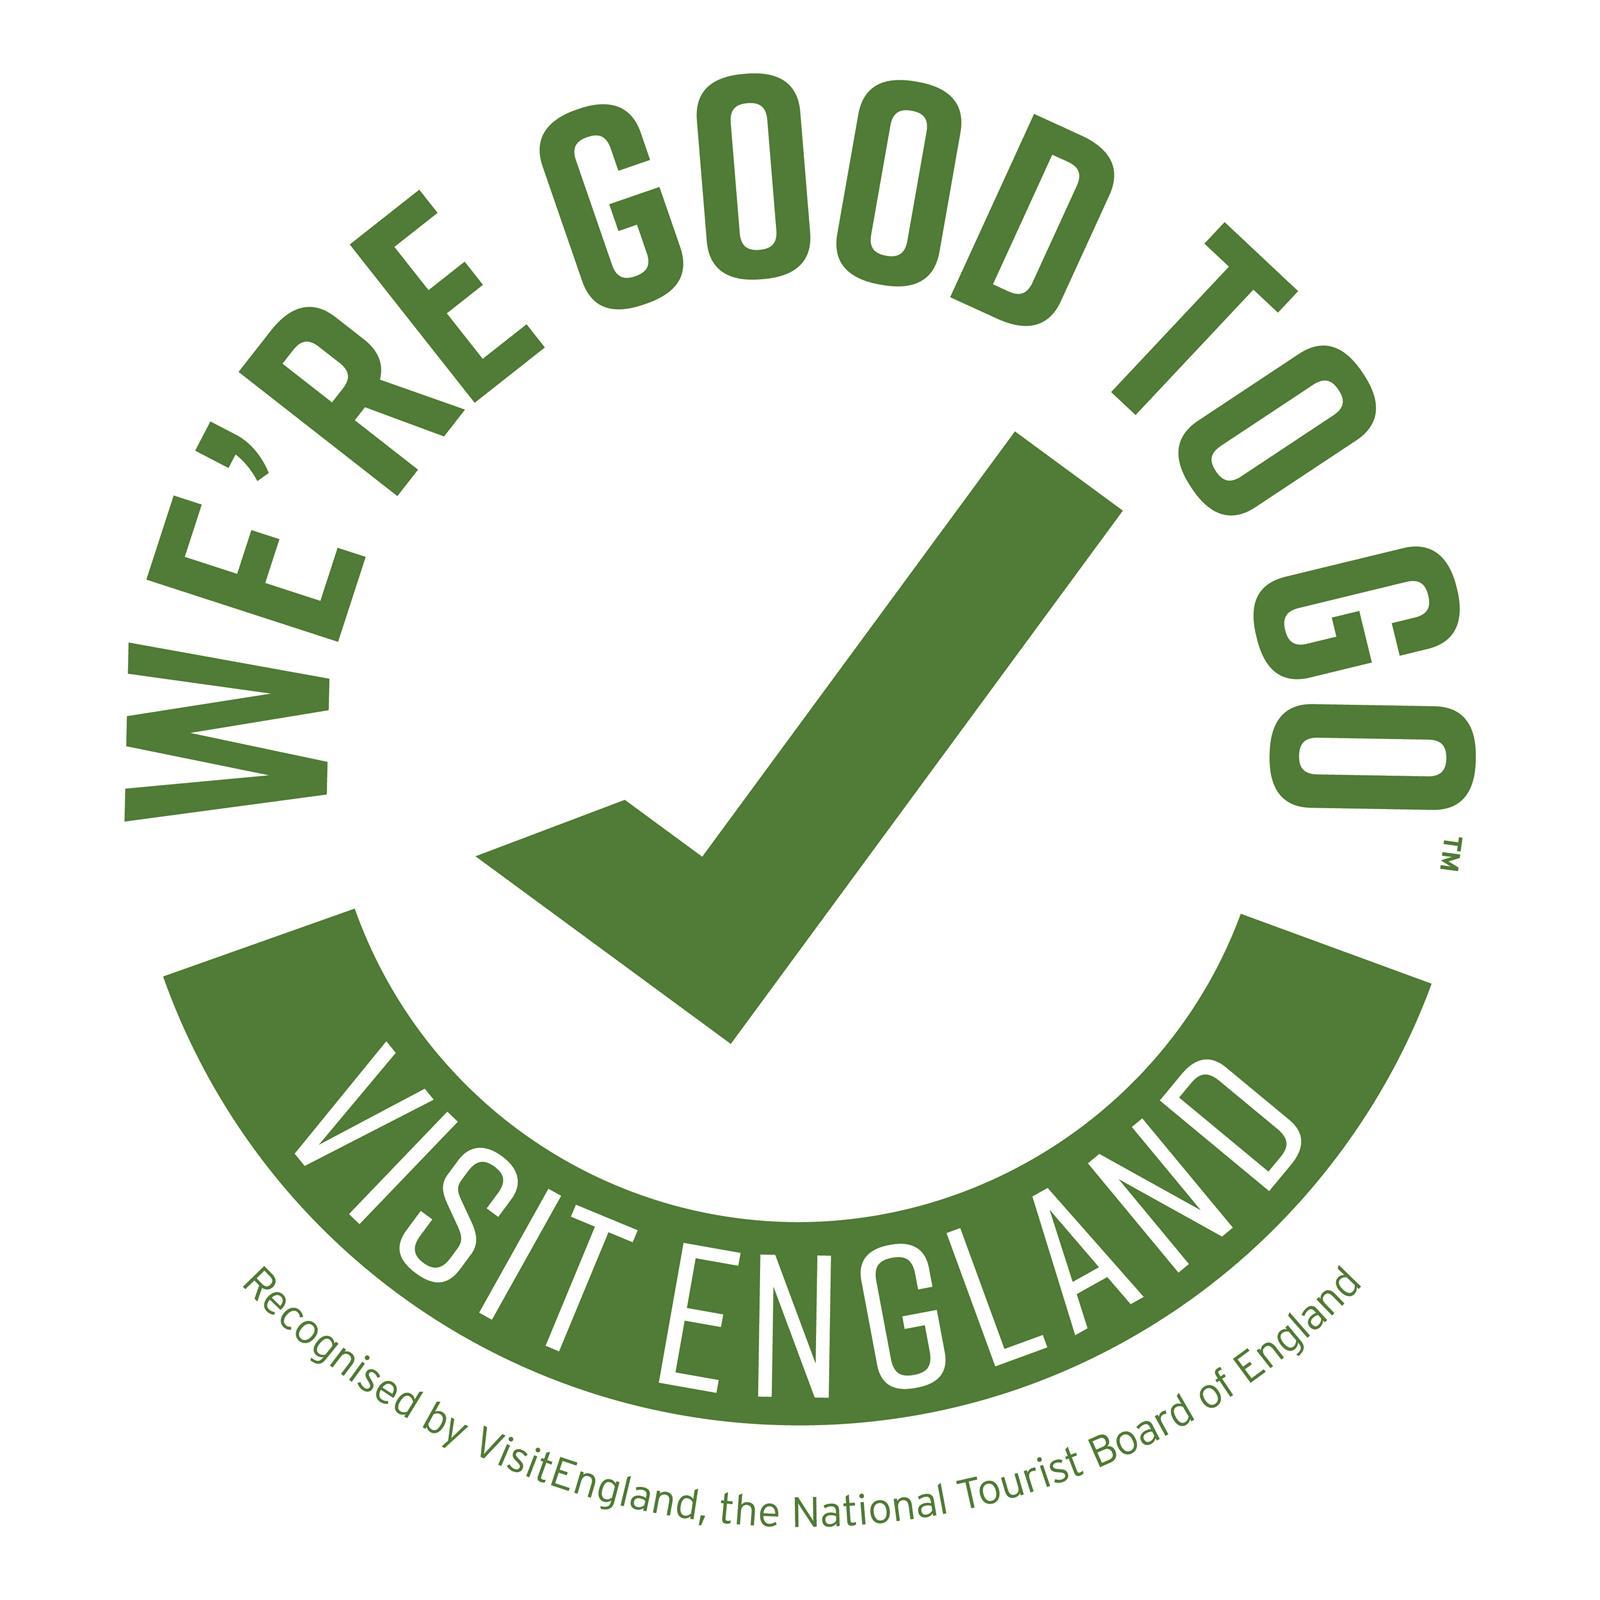 We're Good to Go - VisitEngland Covid-19 accreditation scheme